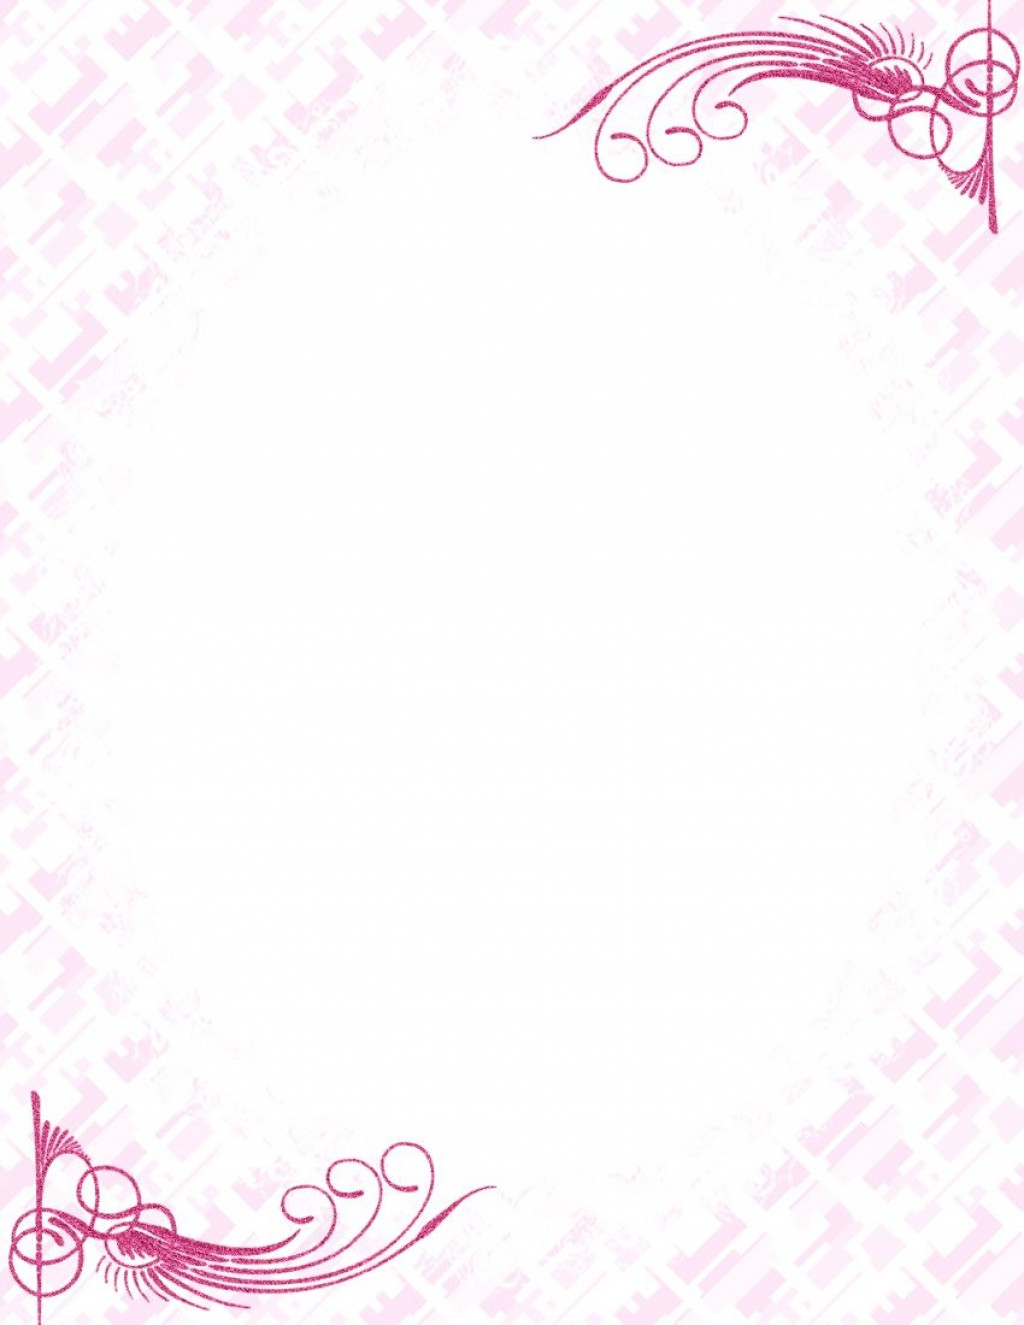 009 Unbelievable Free Printable Elegant Stationery Template Idea  TemplatesLarge